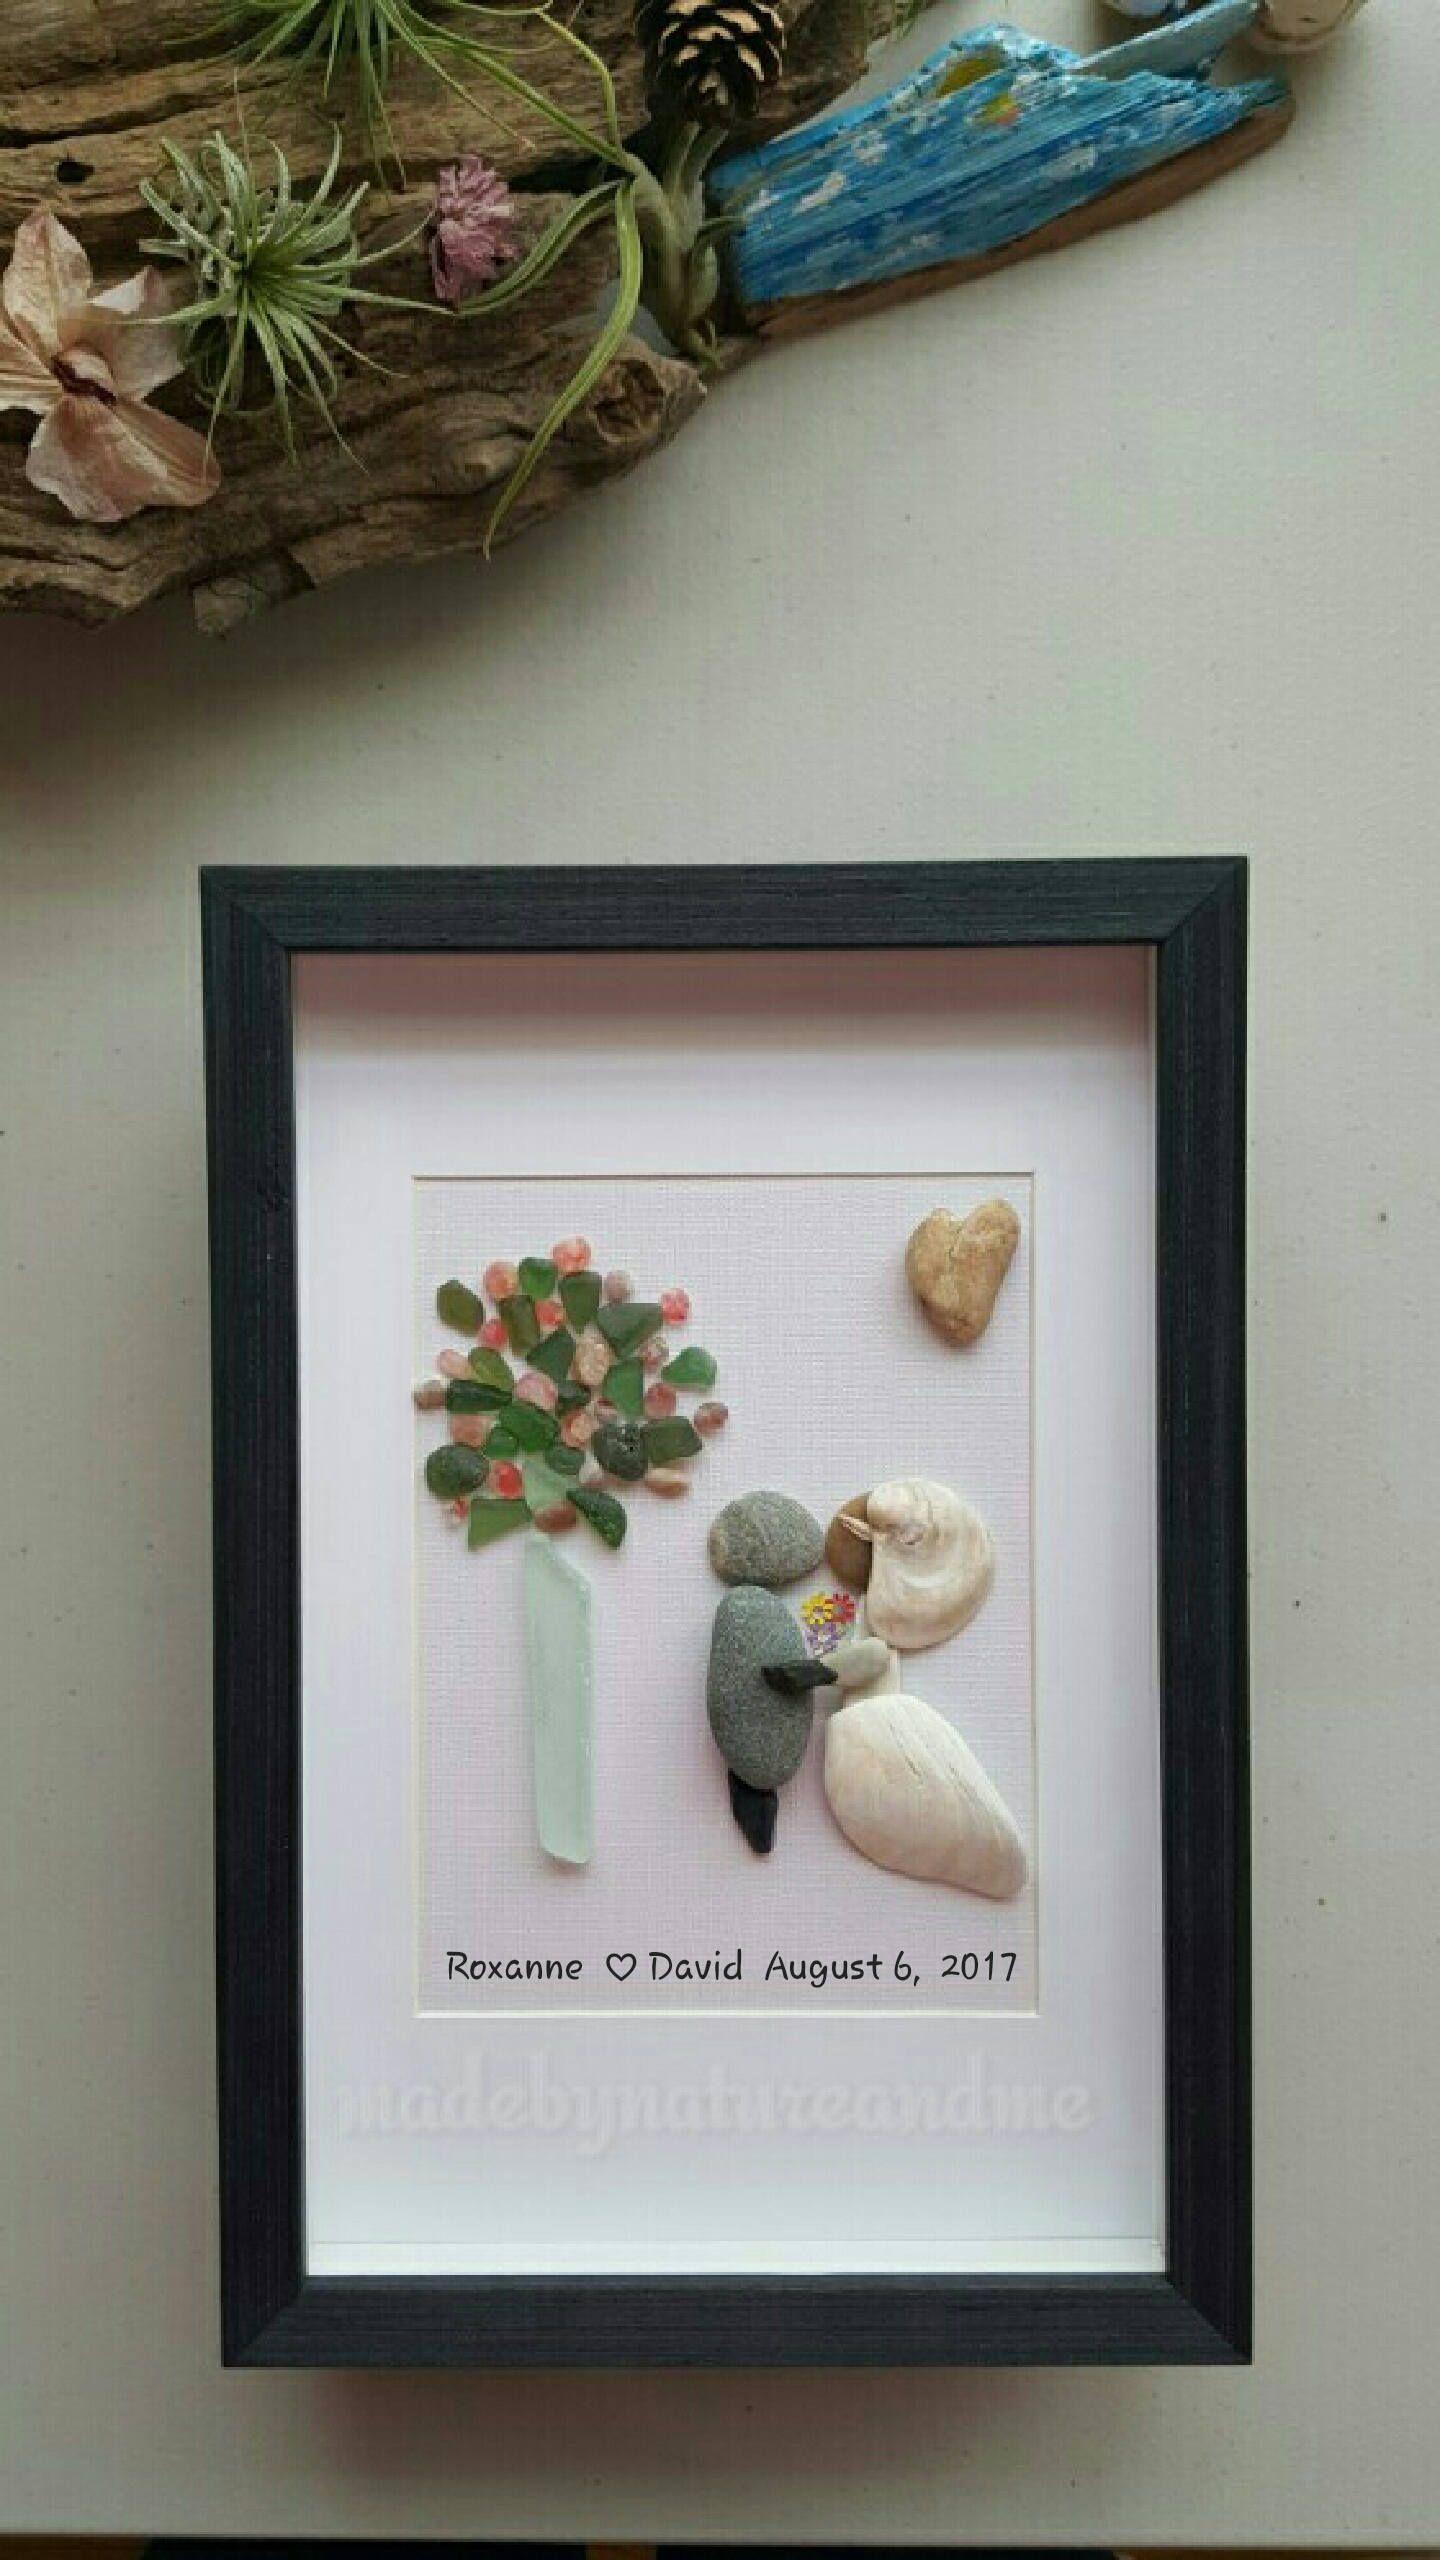 Mixed Media Wedding Gift Art Sea Gl Personalized Pebble Rock Shells By